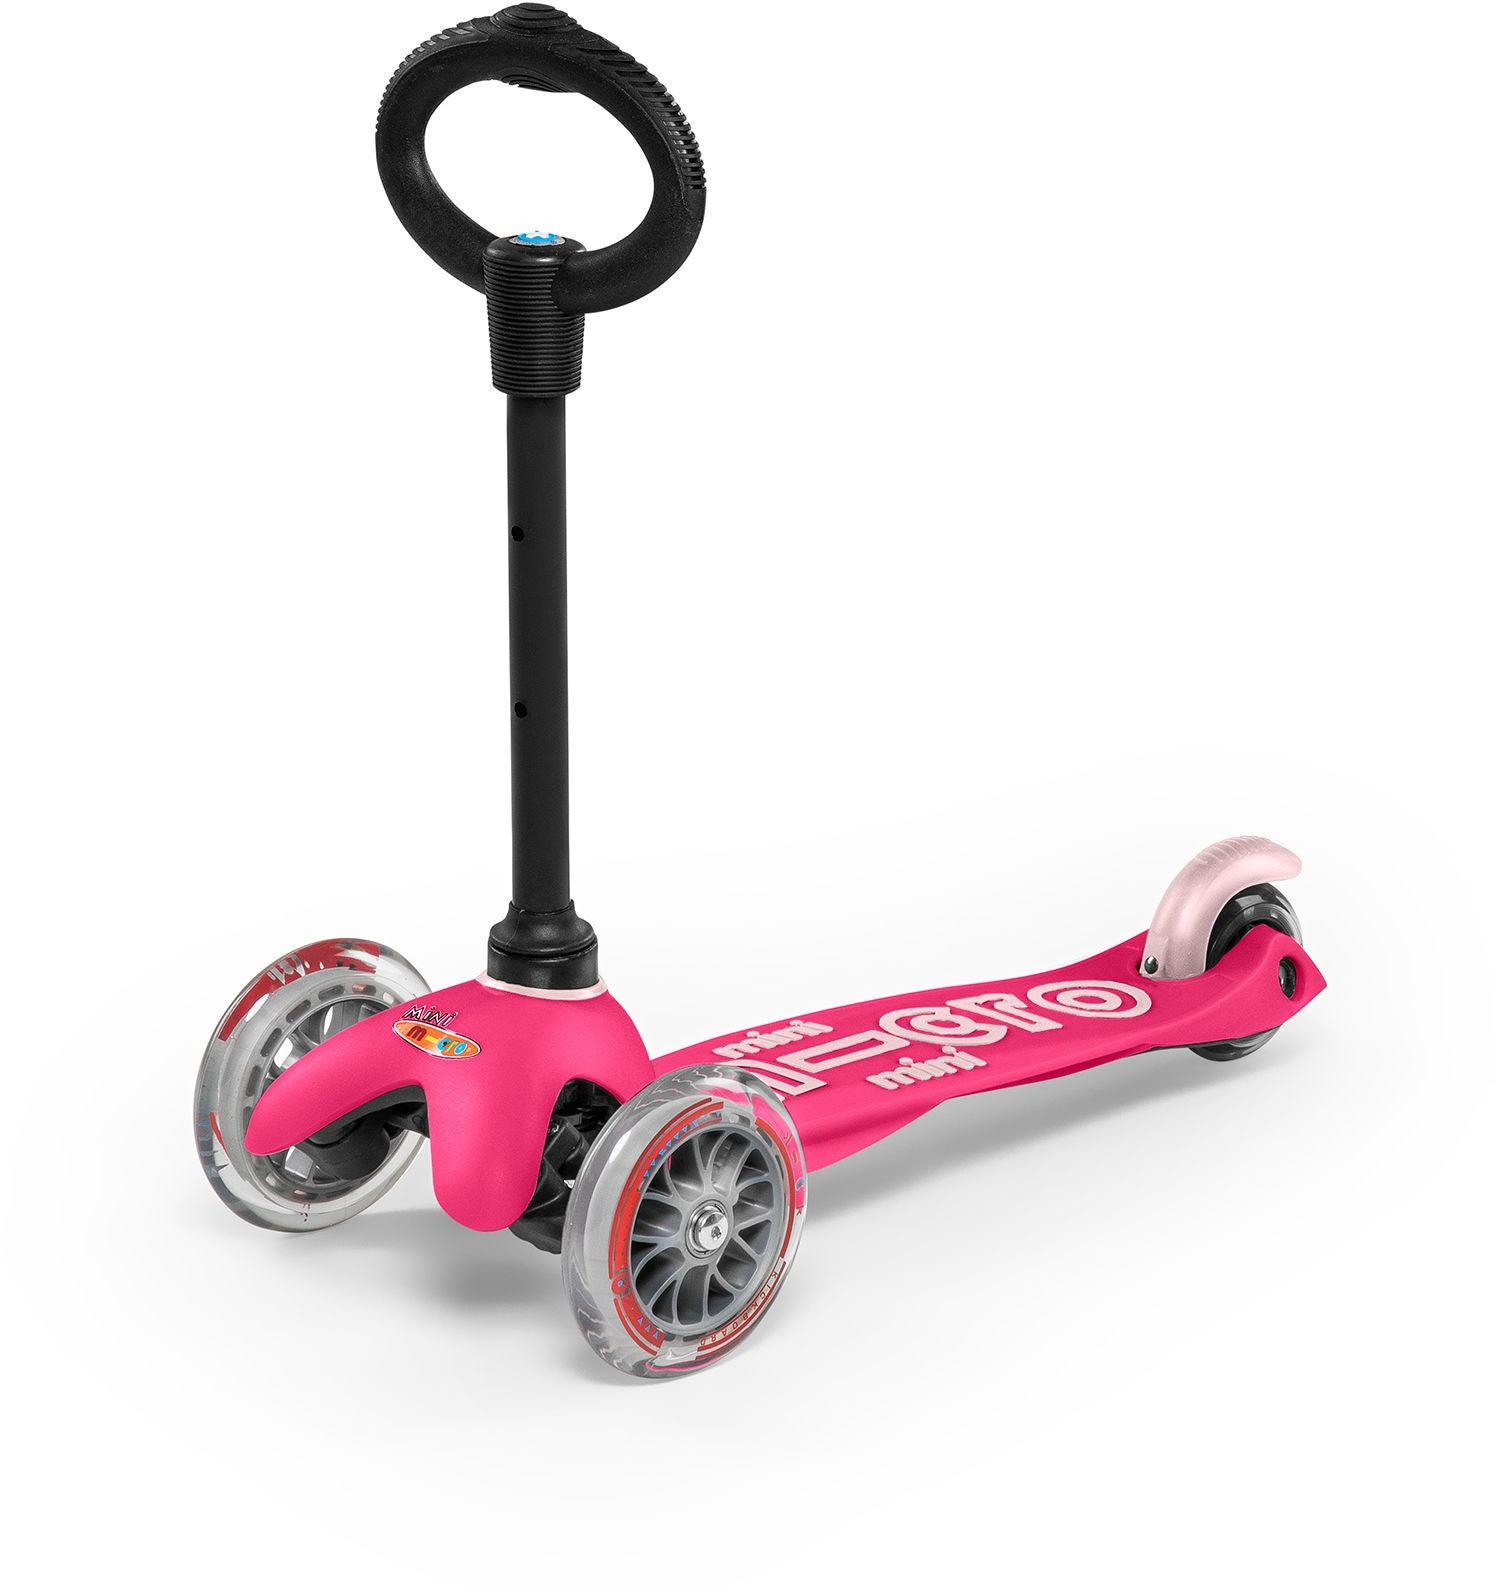 Micro Sparkcykel Trehjuling Mini 3-i-1 Deluxe, Rosa